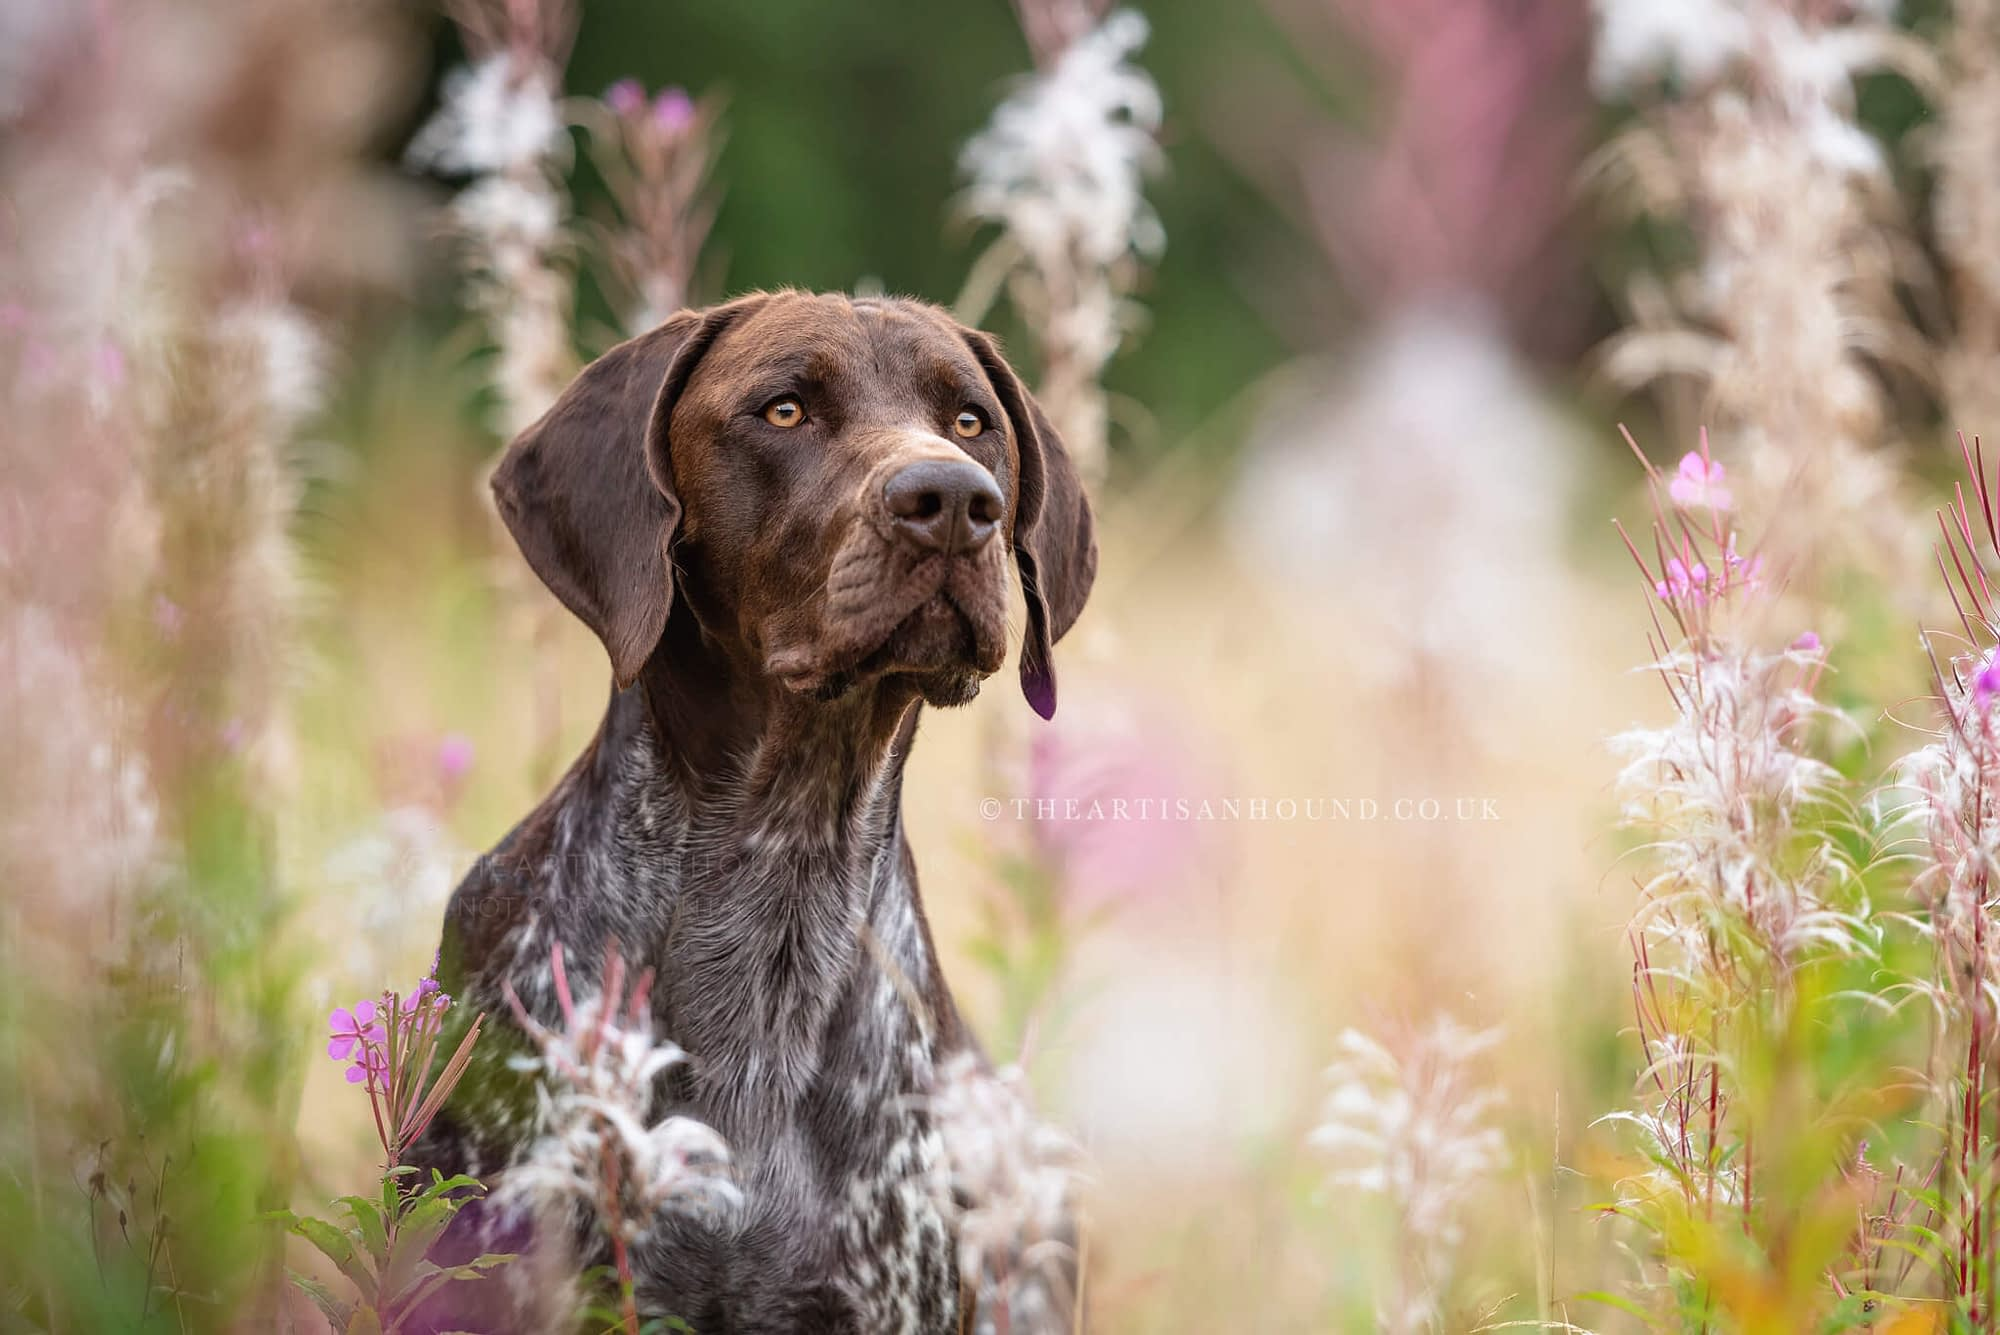 Pointer dog in flowers